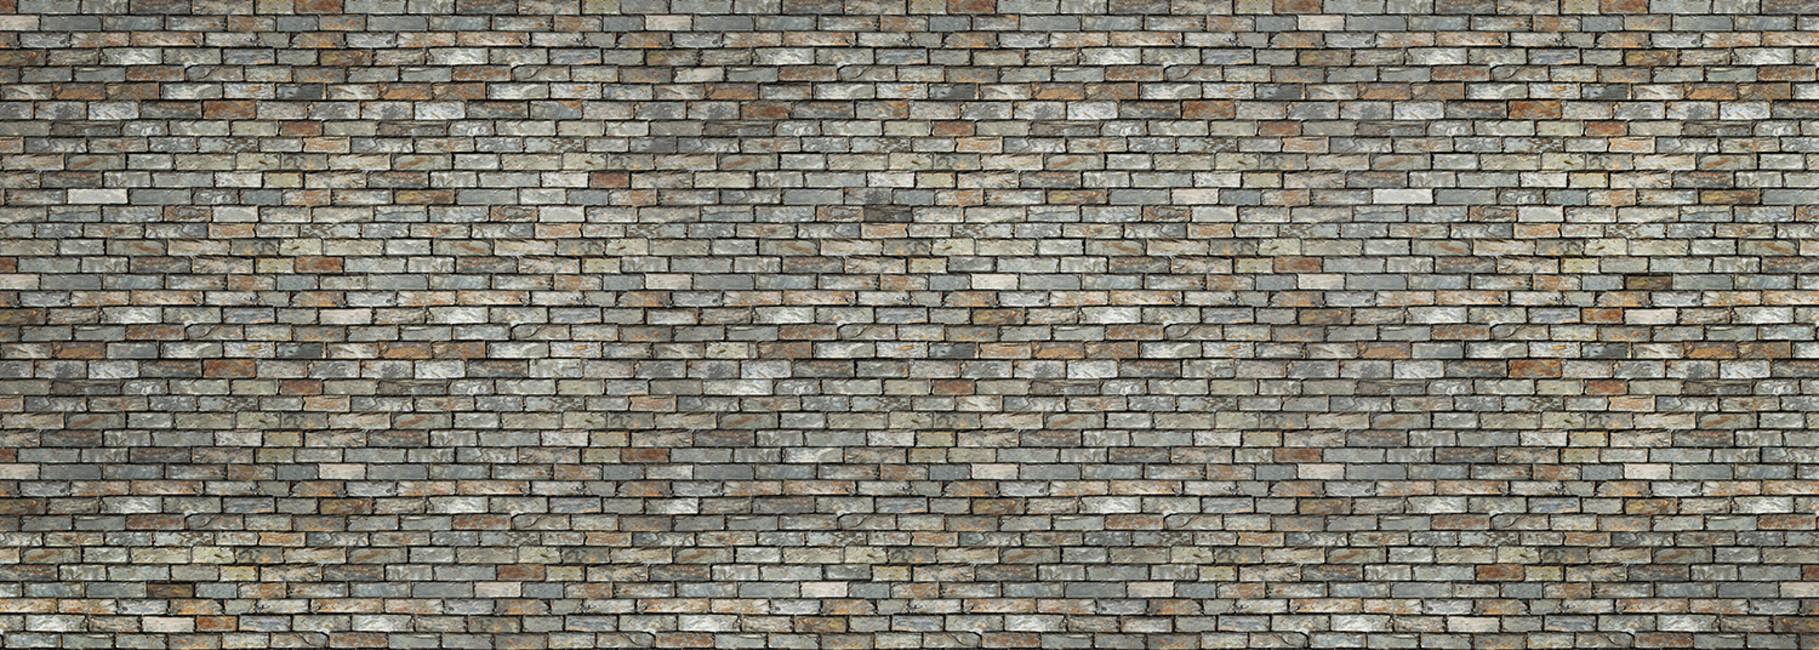 Stone Wall   Wall Mural Photo Wallpaper   Photowall 1819x650